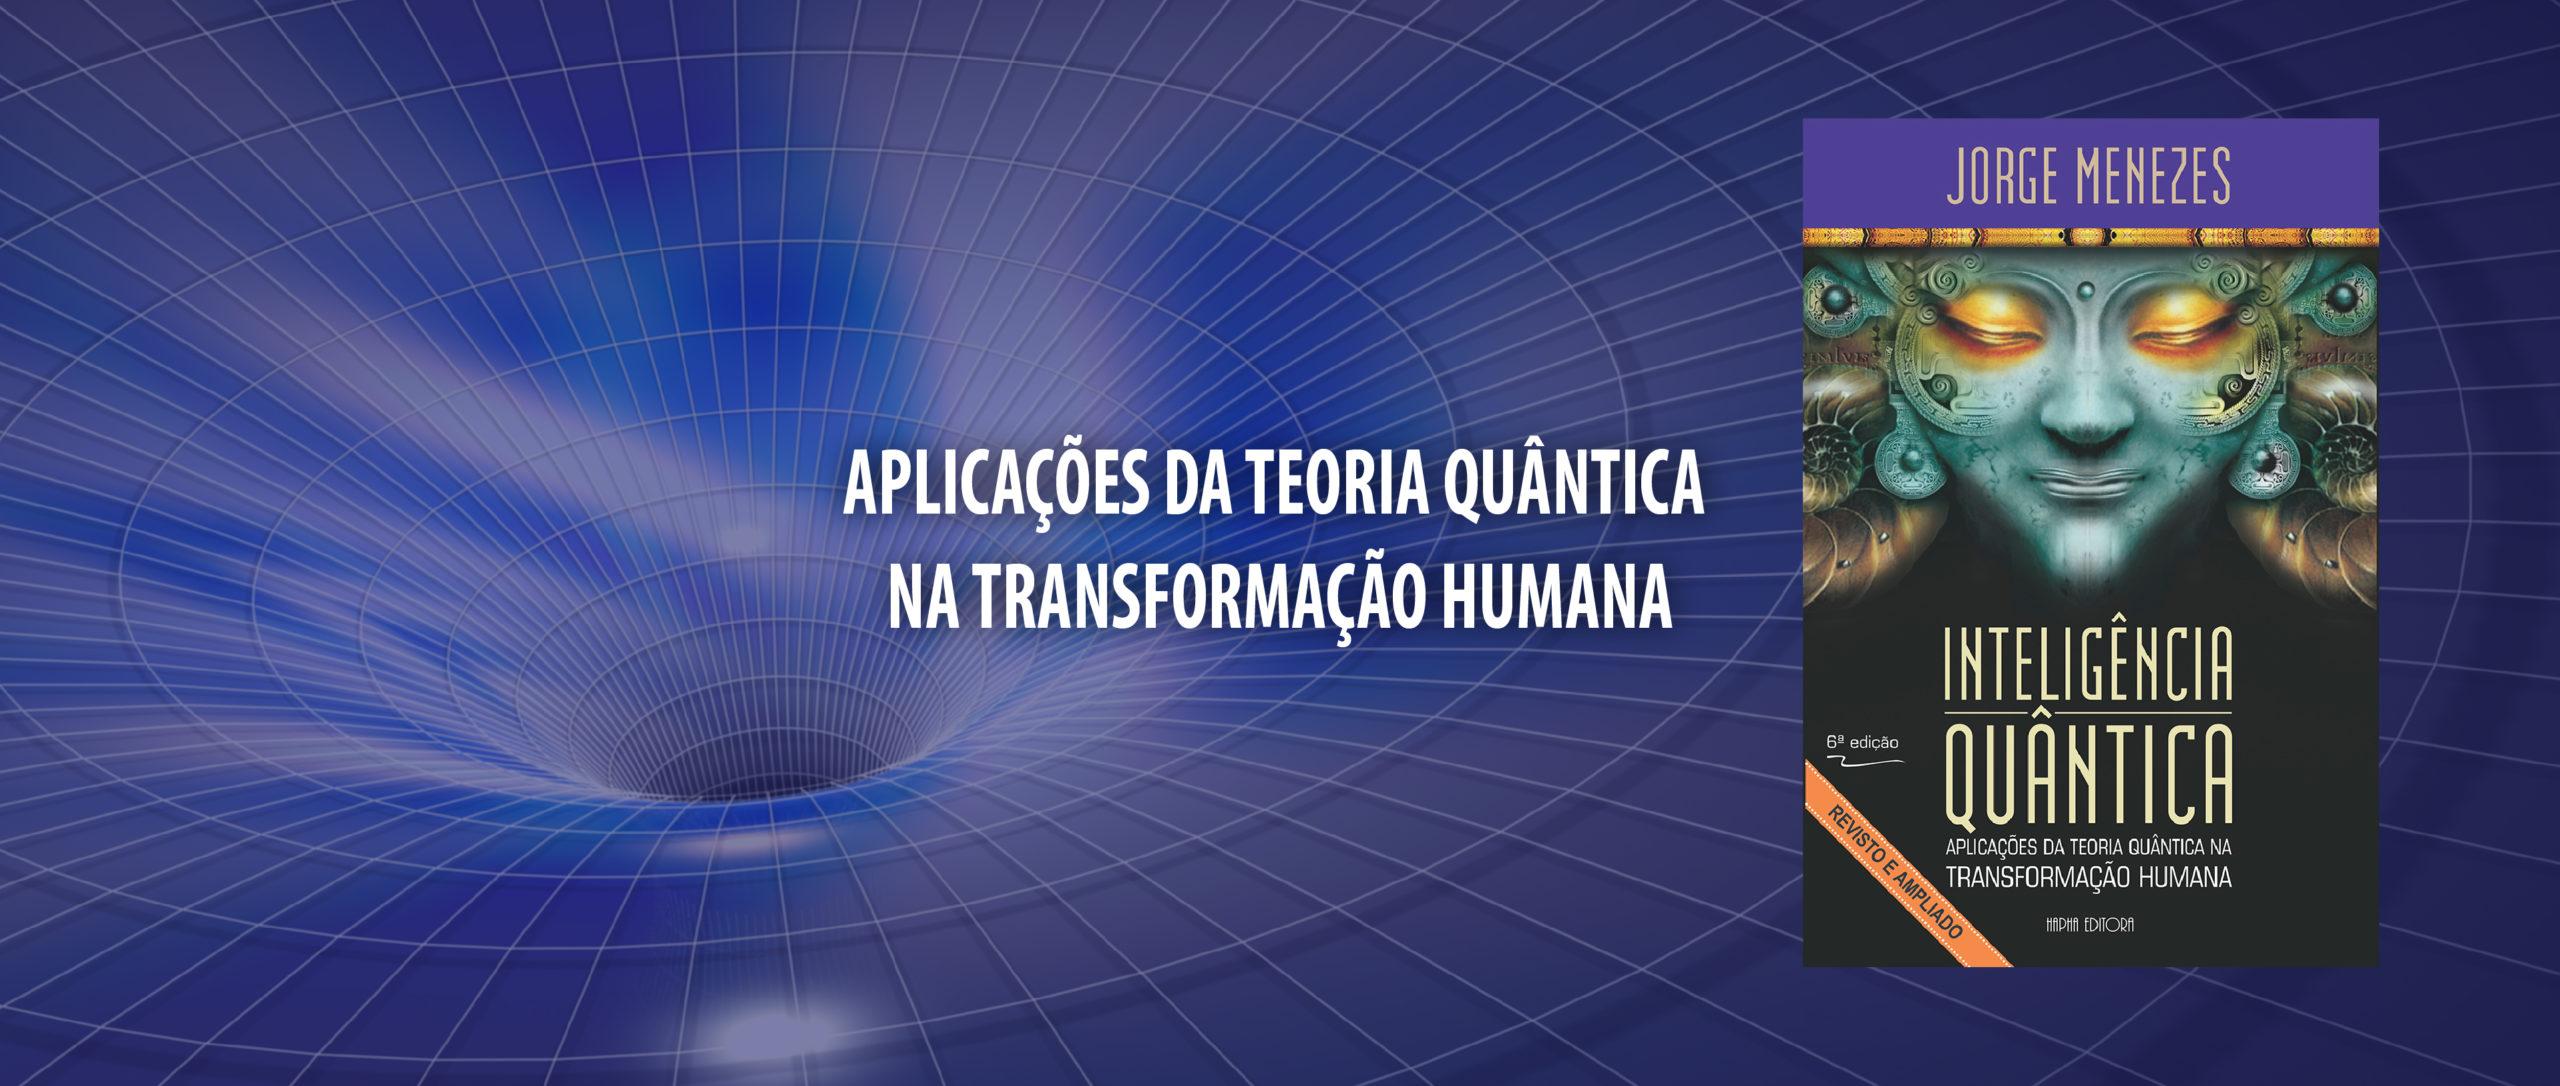 inteligência quântica1-01